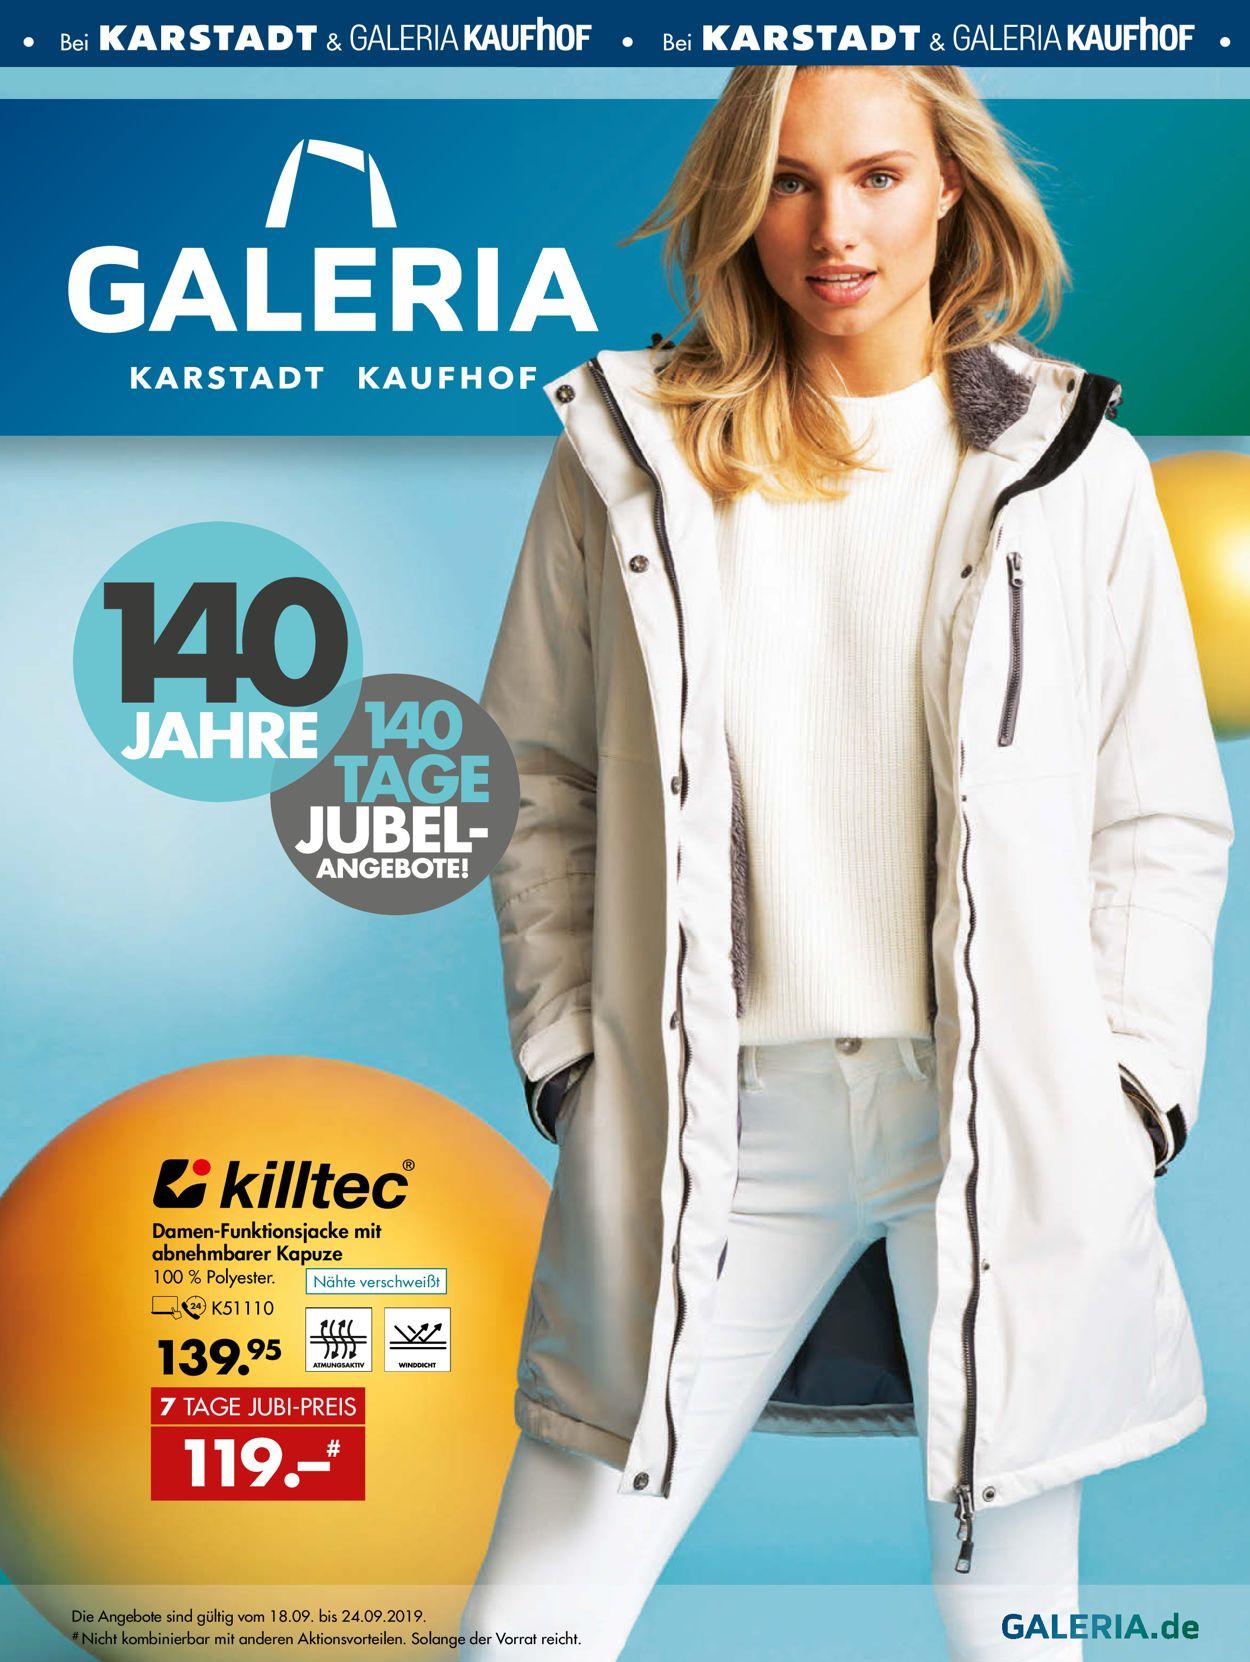 GALERIA Kaufhof Aktueller Prospekt 18.09 24.09.2019